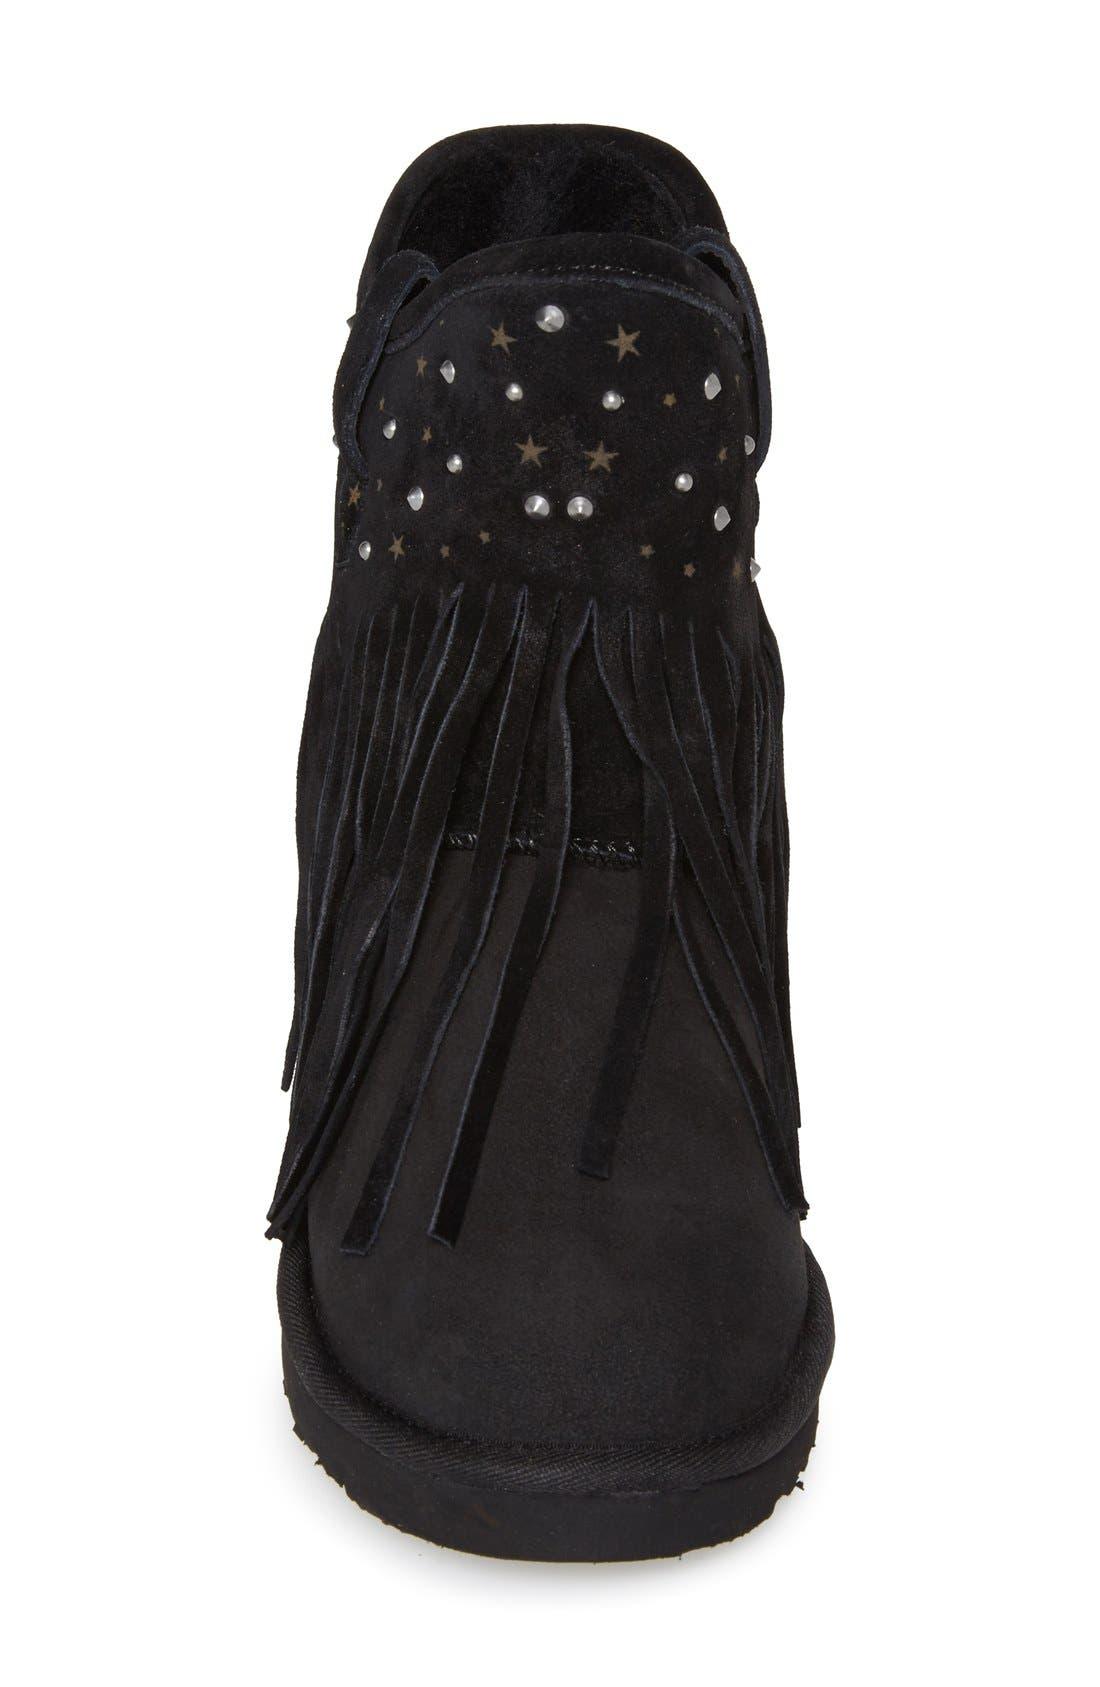 Alternate Image 3  - Koolaburra 'Haley - Starlight' Genuine Shearling Short Boot (Women)